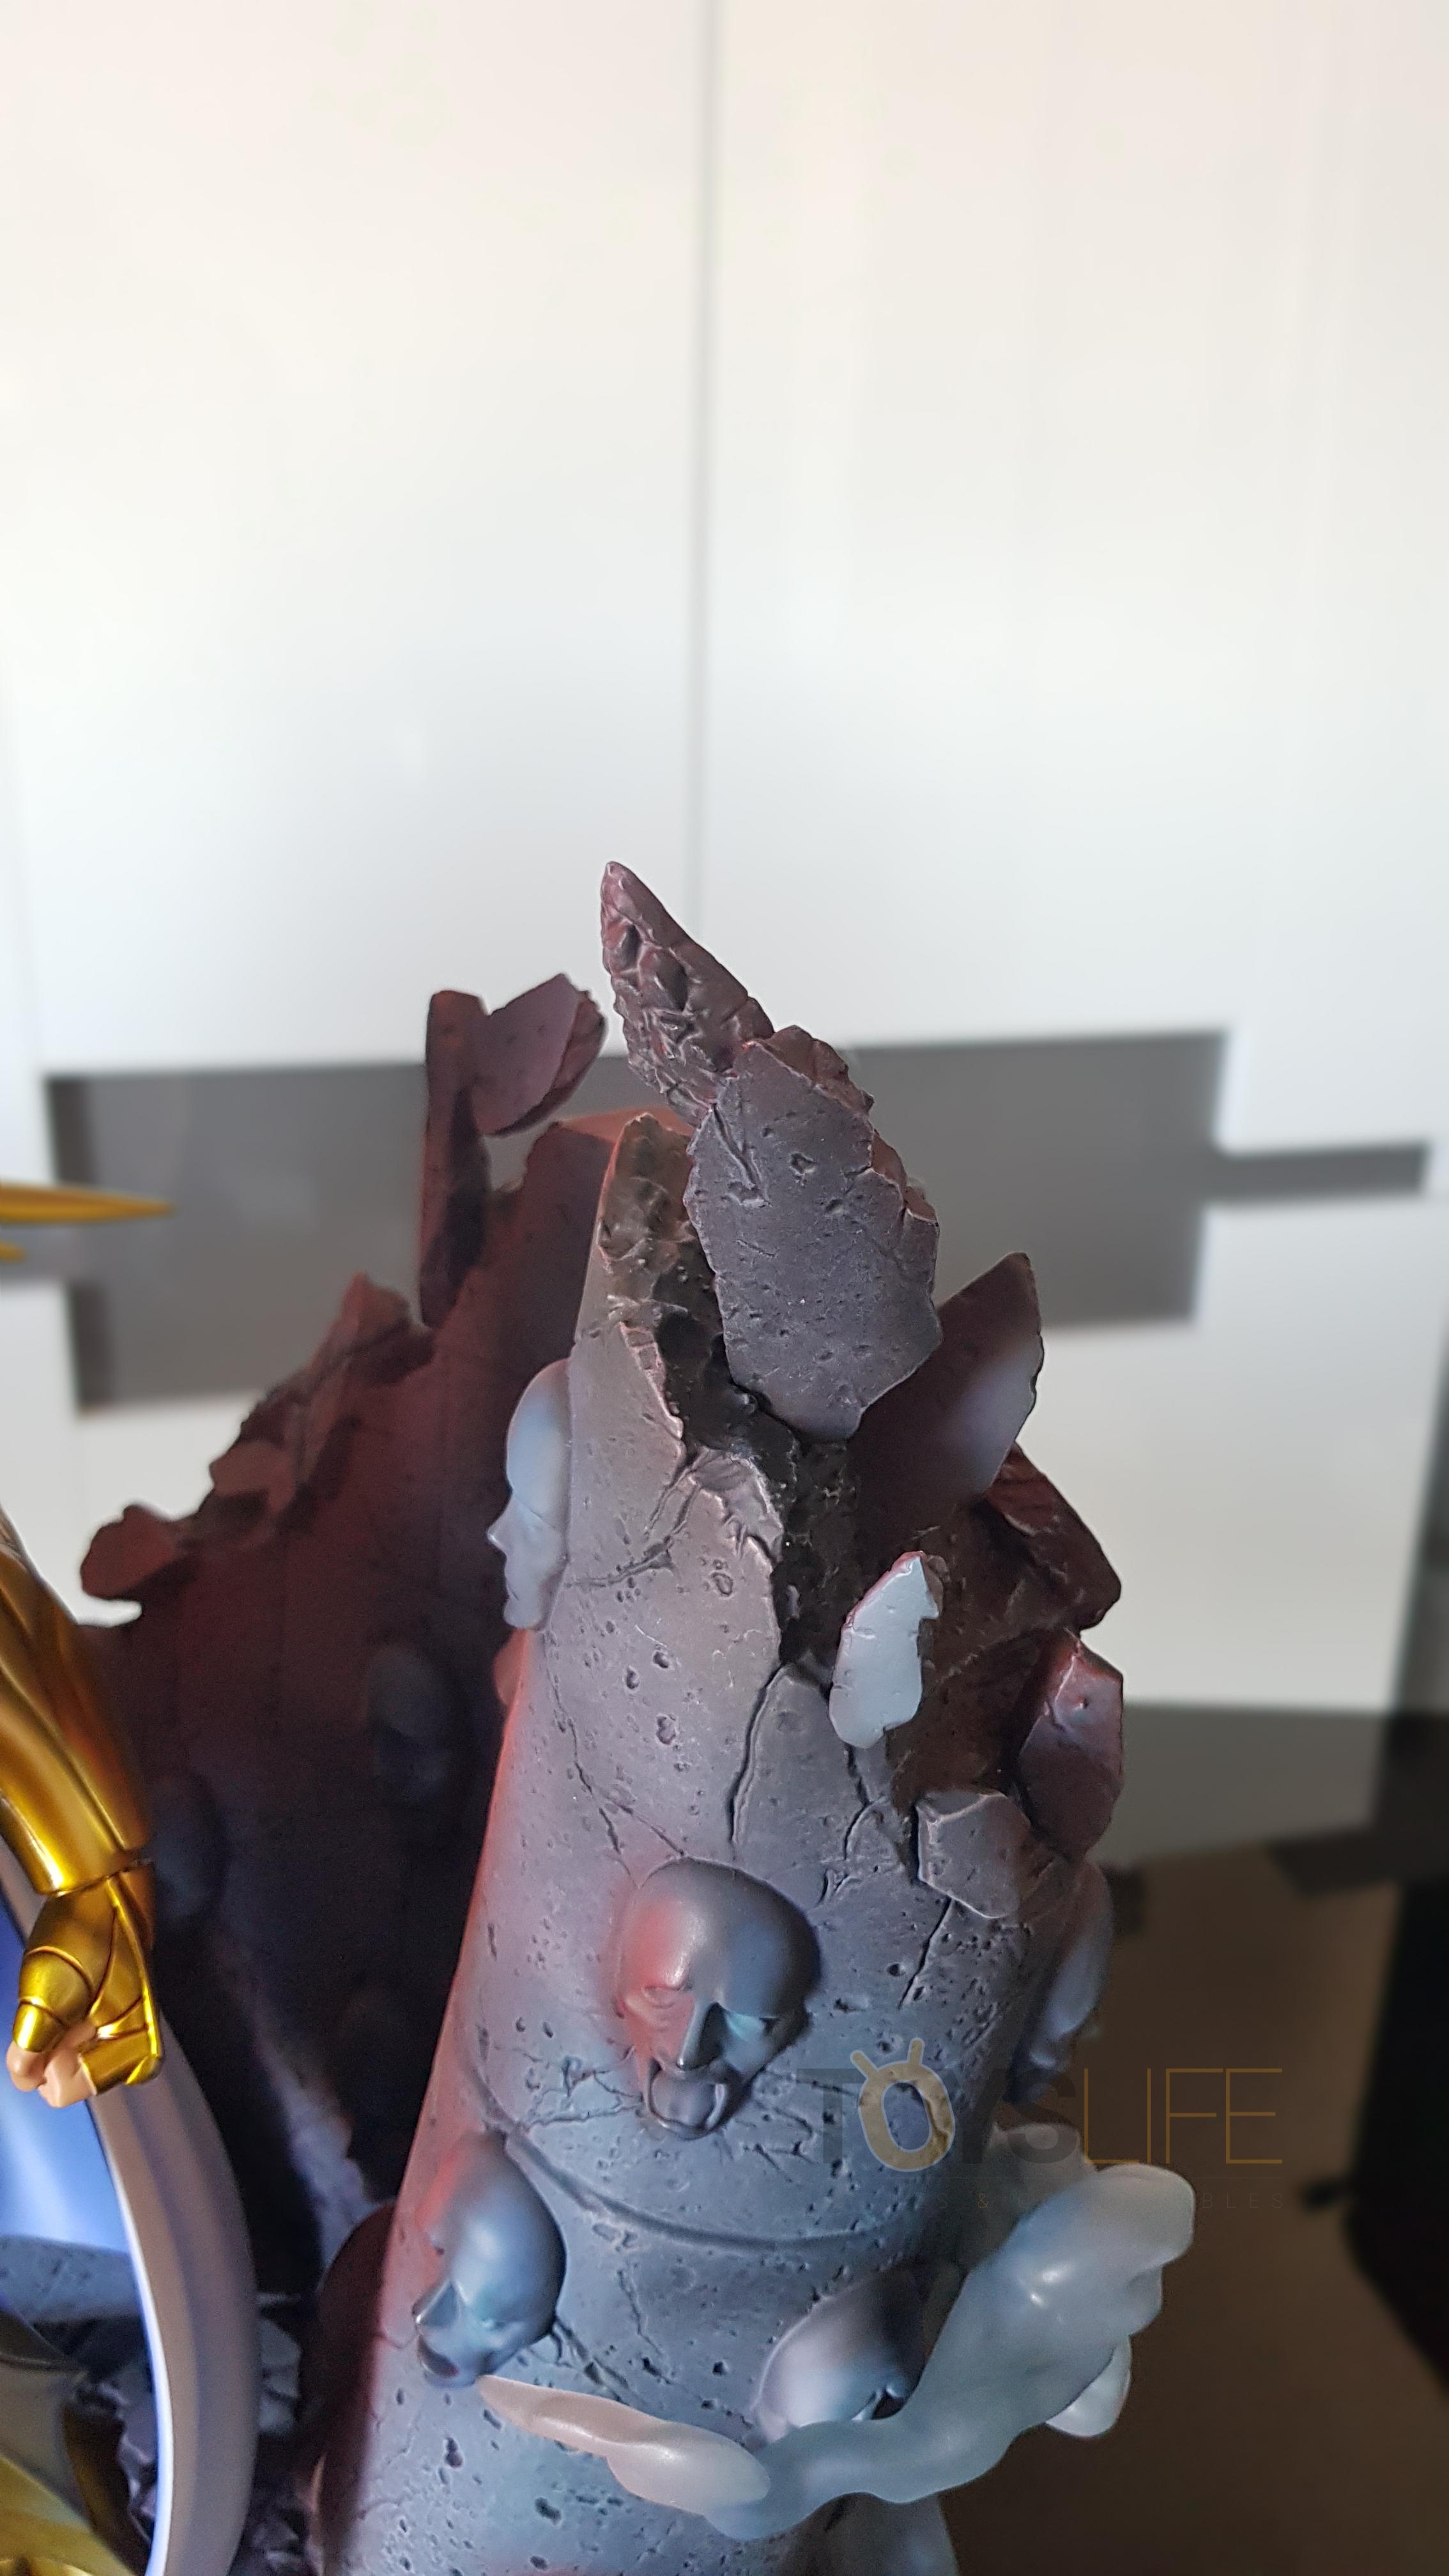 tsume-art-saint-seiya-gold-saint-death-mask-statue-toyslife-review-19